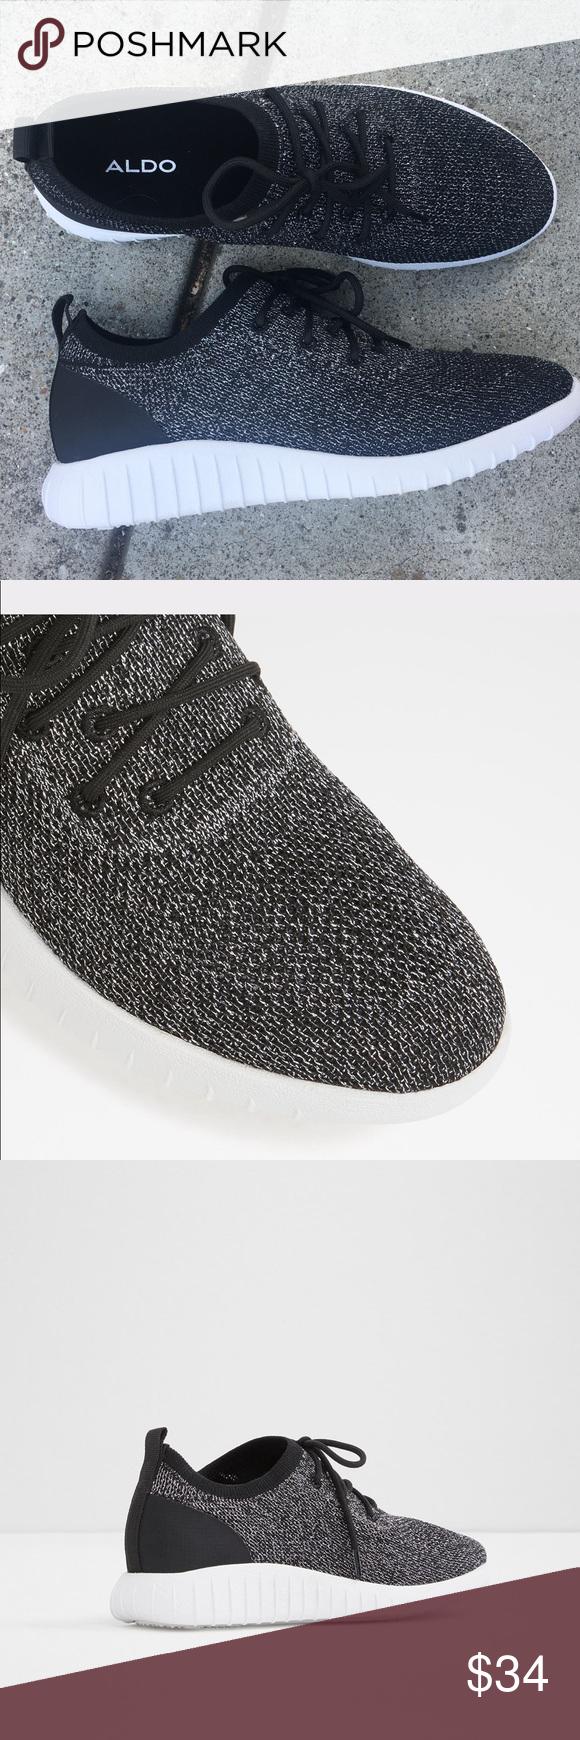 aldo swayze sneakers